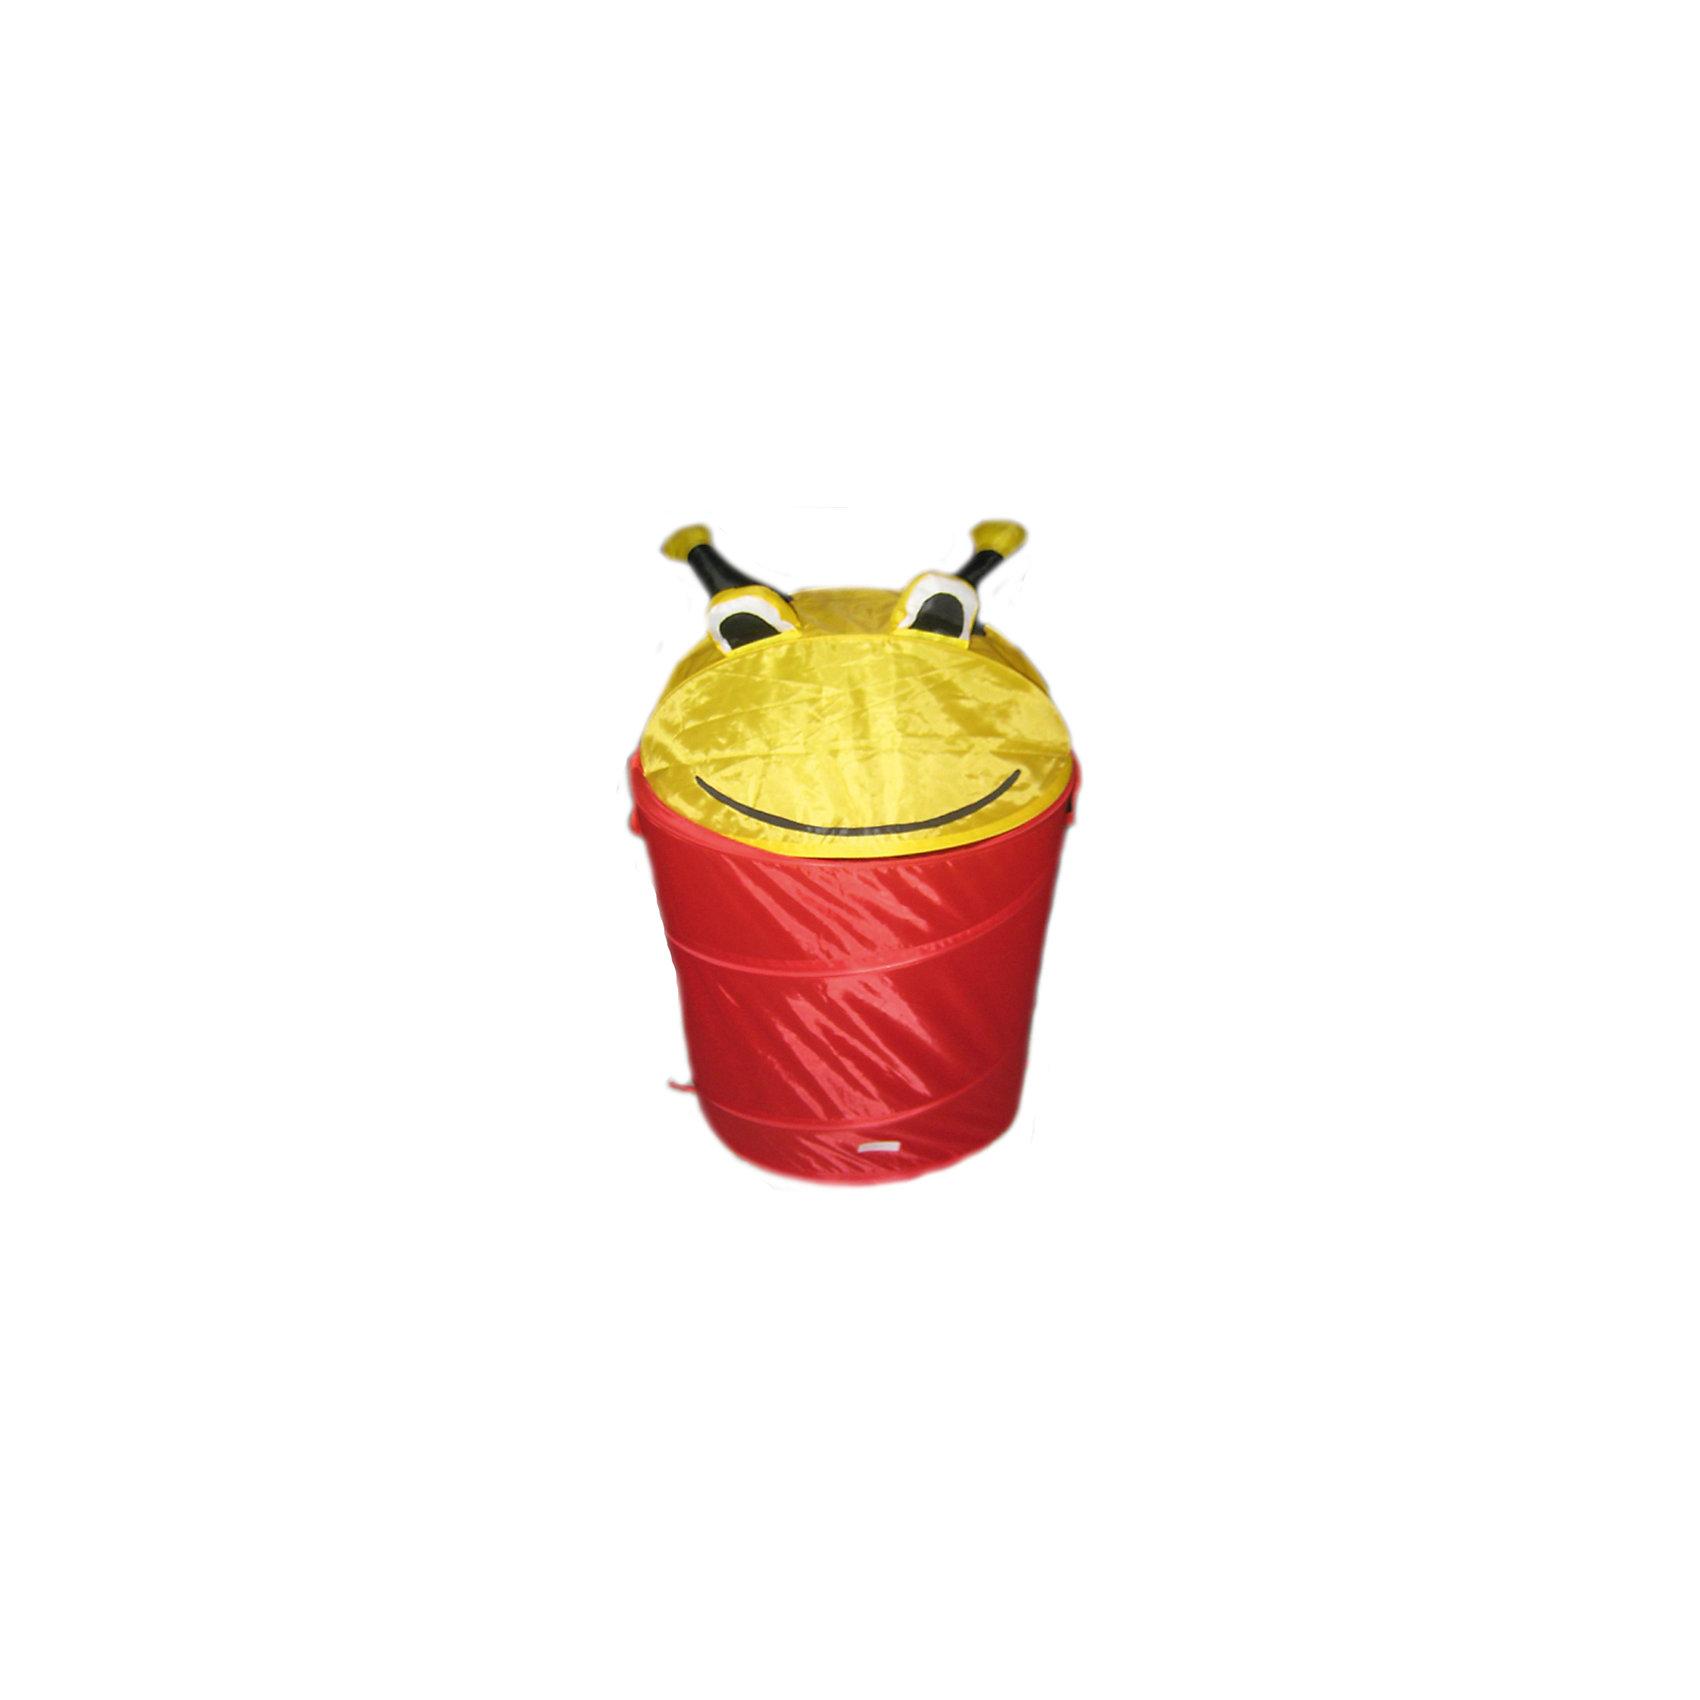 - Корзина для игрушек Глазастик [супермаркет] иномат импорт jingdong офиса хранение корзины кухня хранение корзина отделка корзина корзина хранения pink